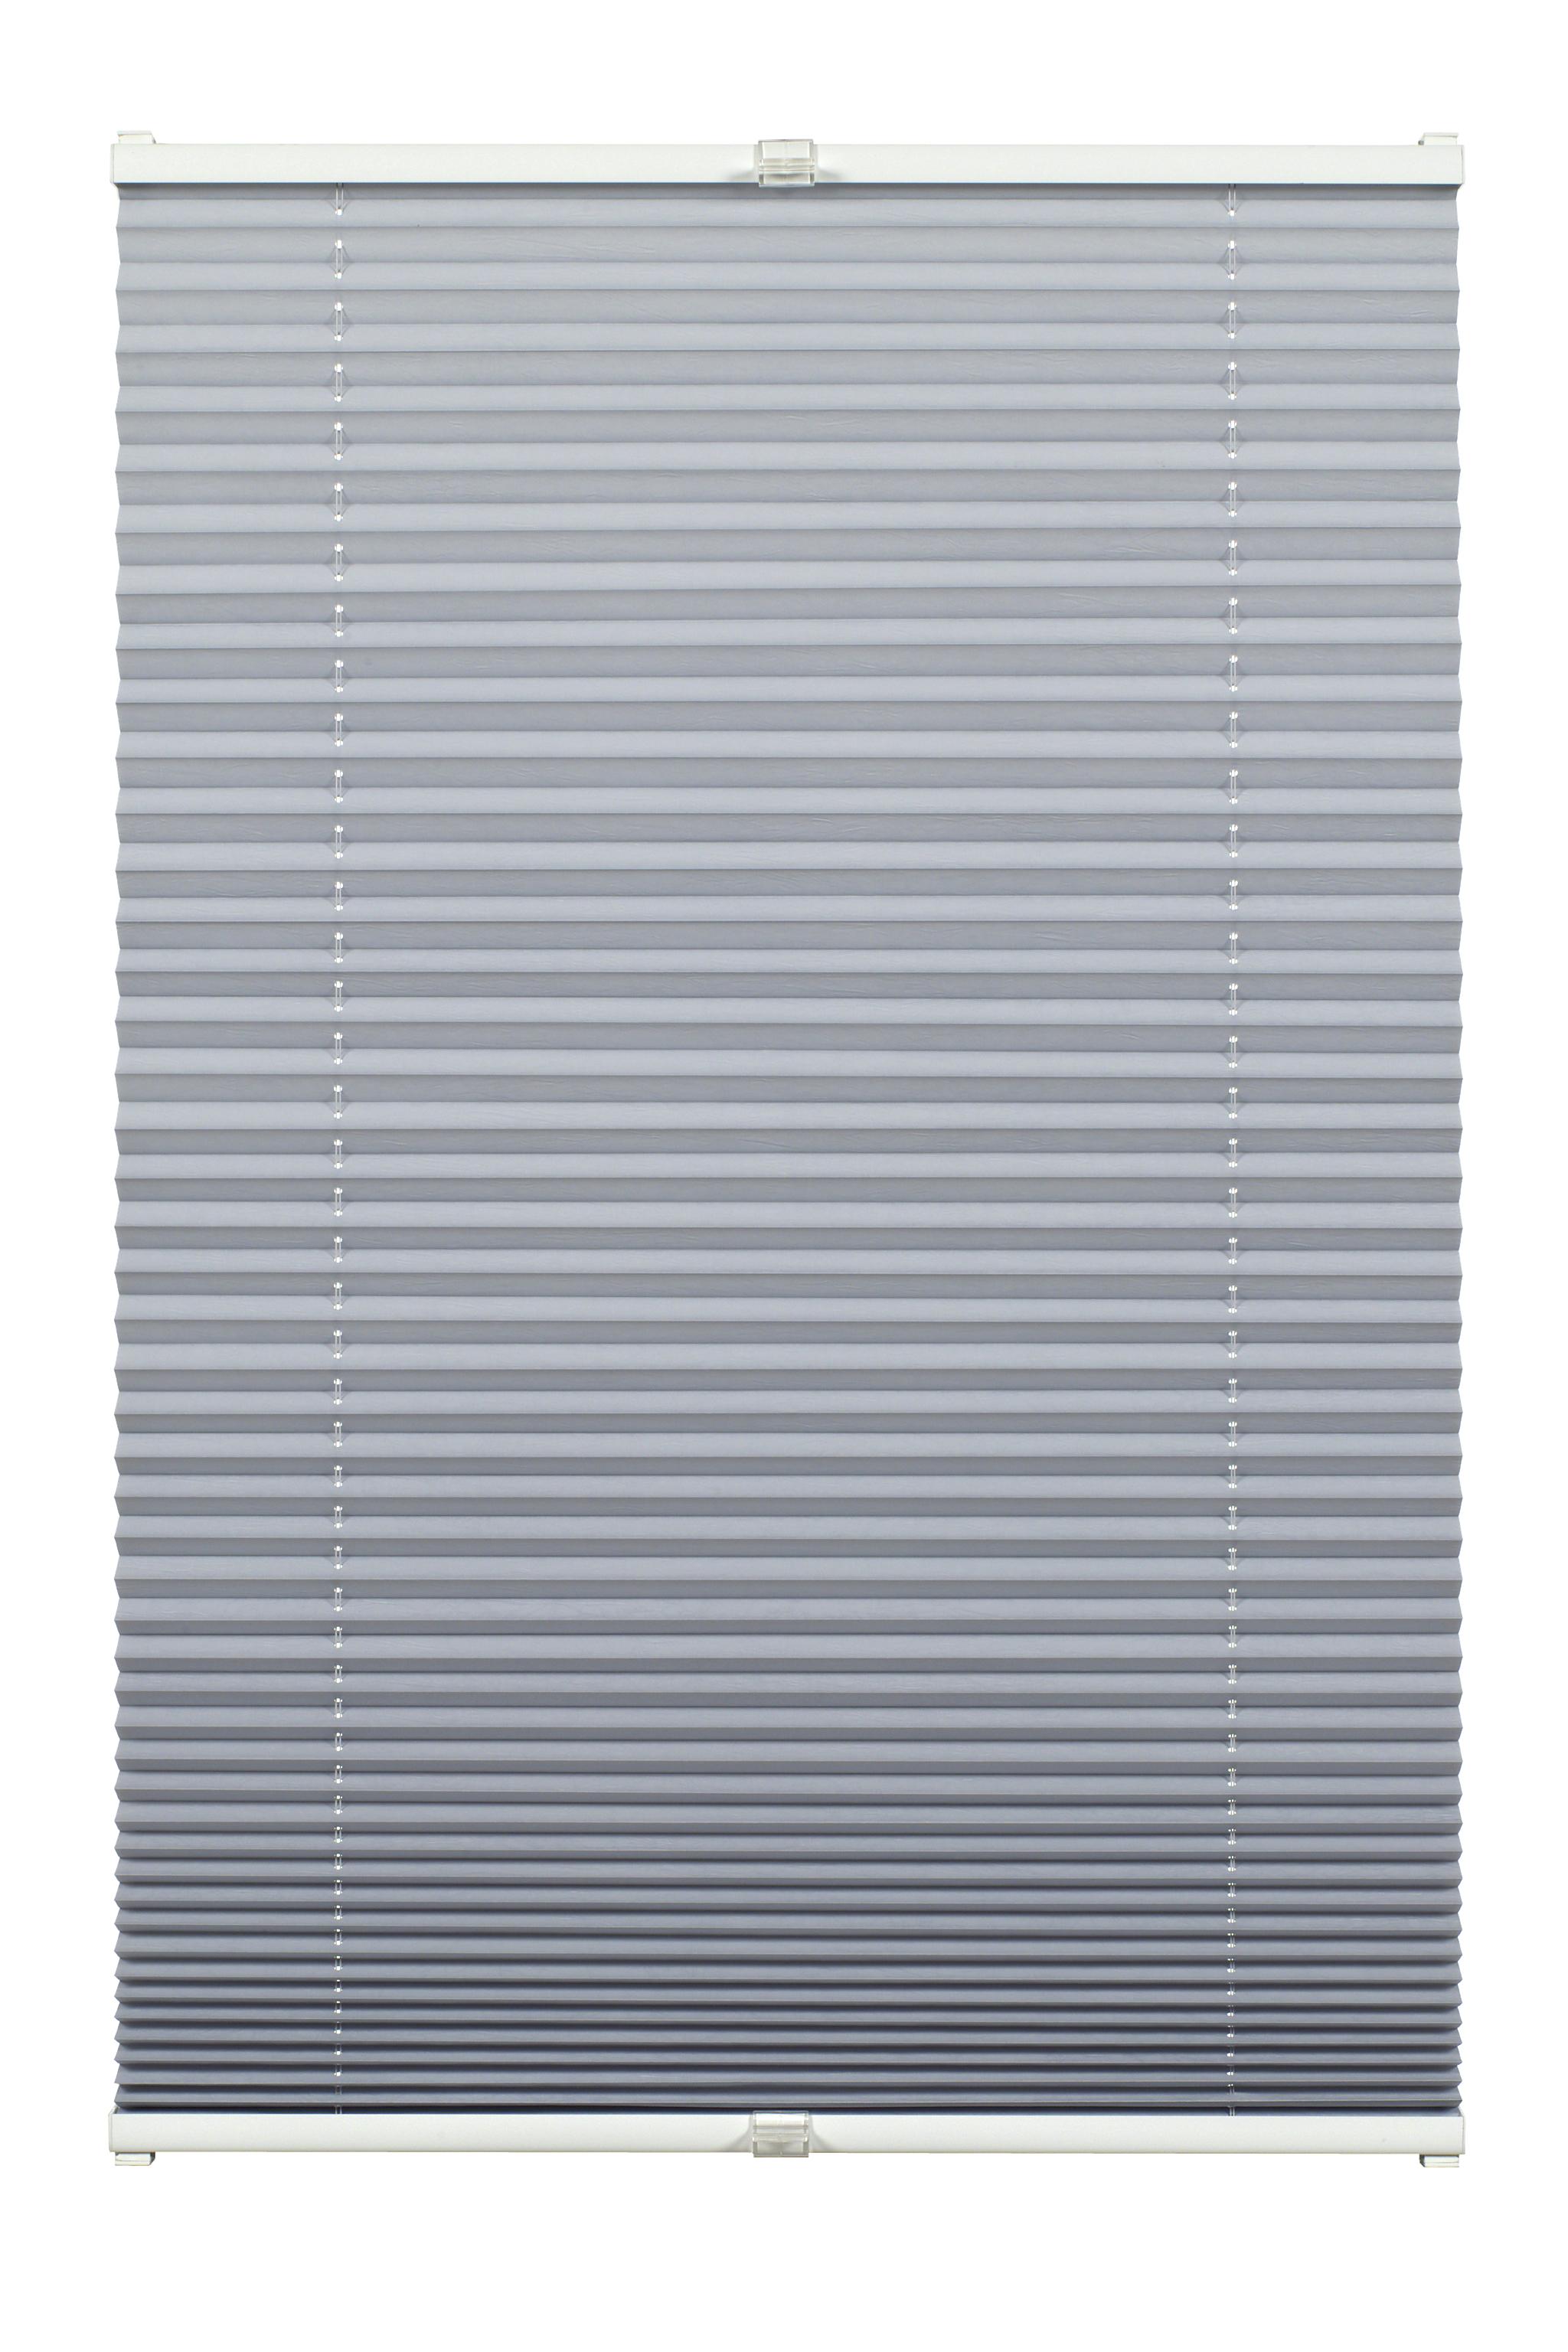 slimfix plissee grau 60 x 130 cm 91 21406013. Black Bedroom Furniture Sets. Home Design Ideas